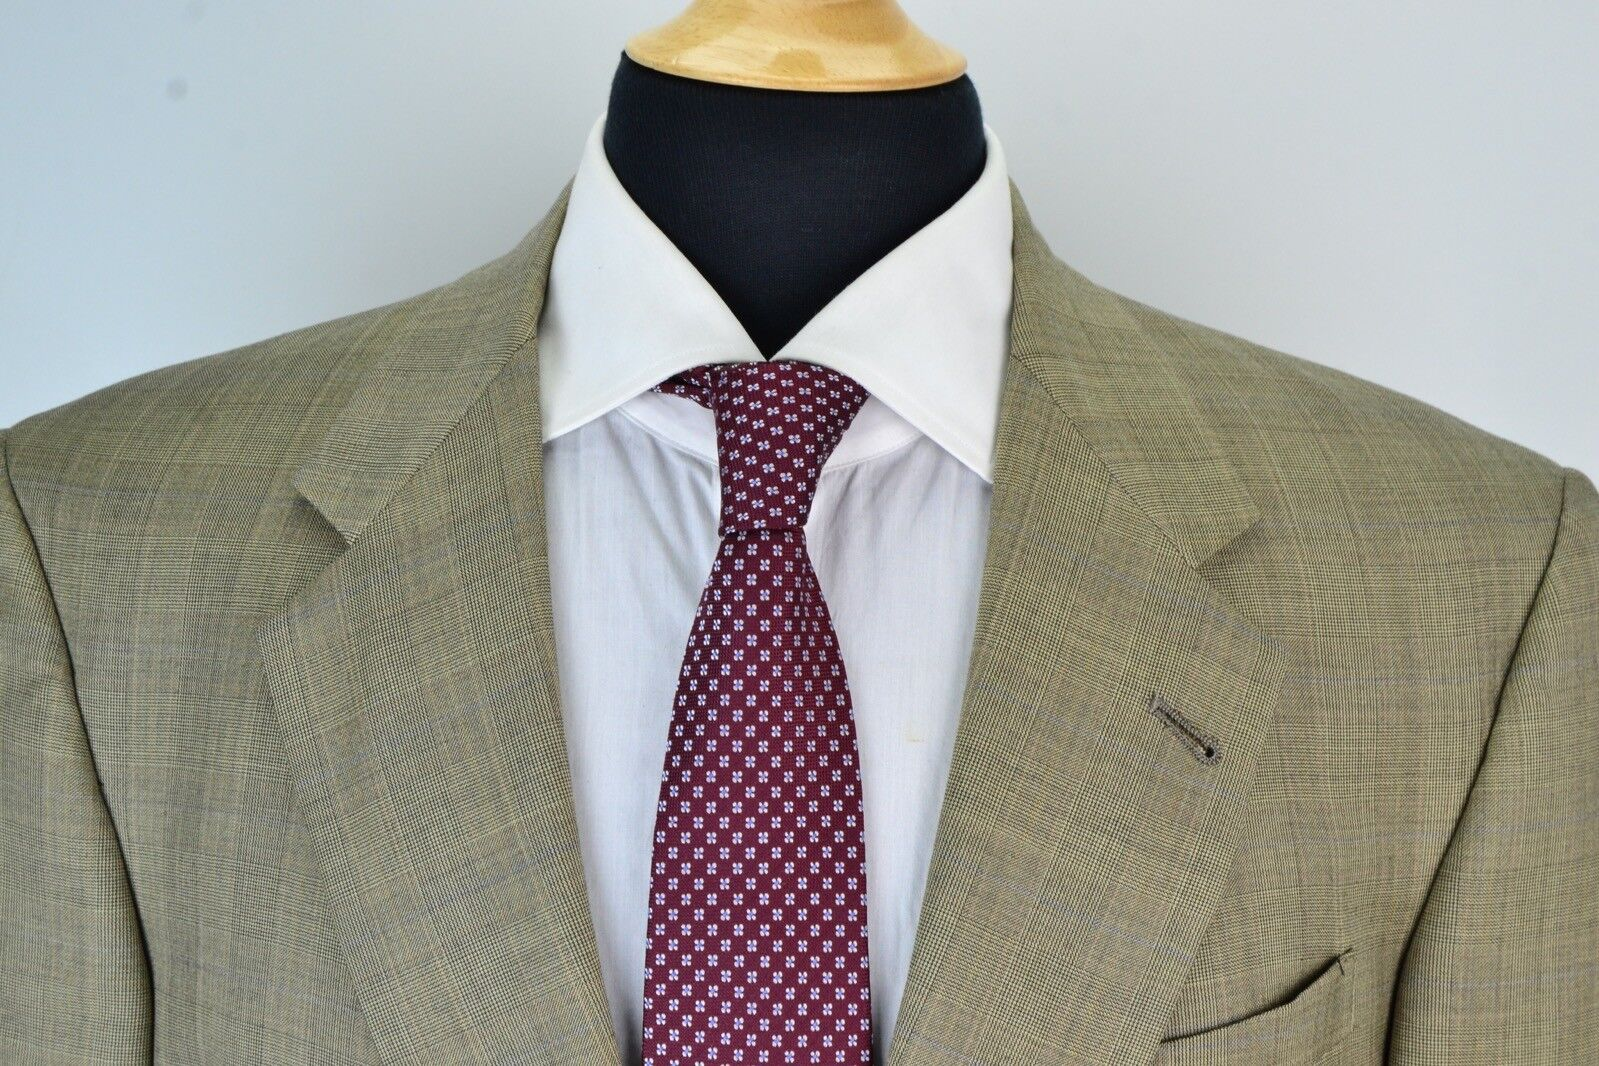 Hart Schaffner & Marx Gold Trumpeter Light Braun Blau Plaid Wool 2 Pc Suit 41R